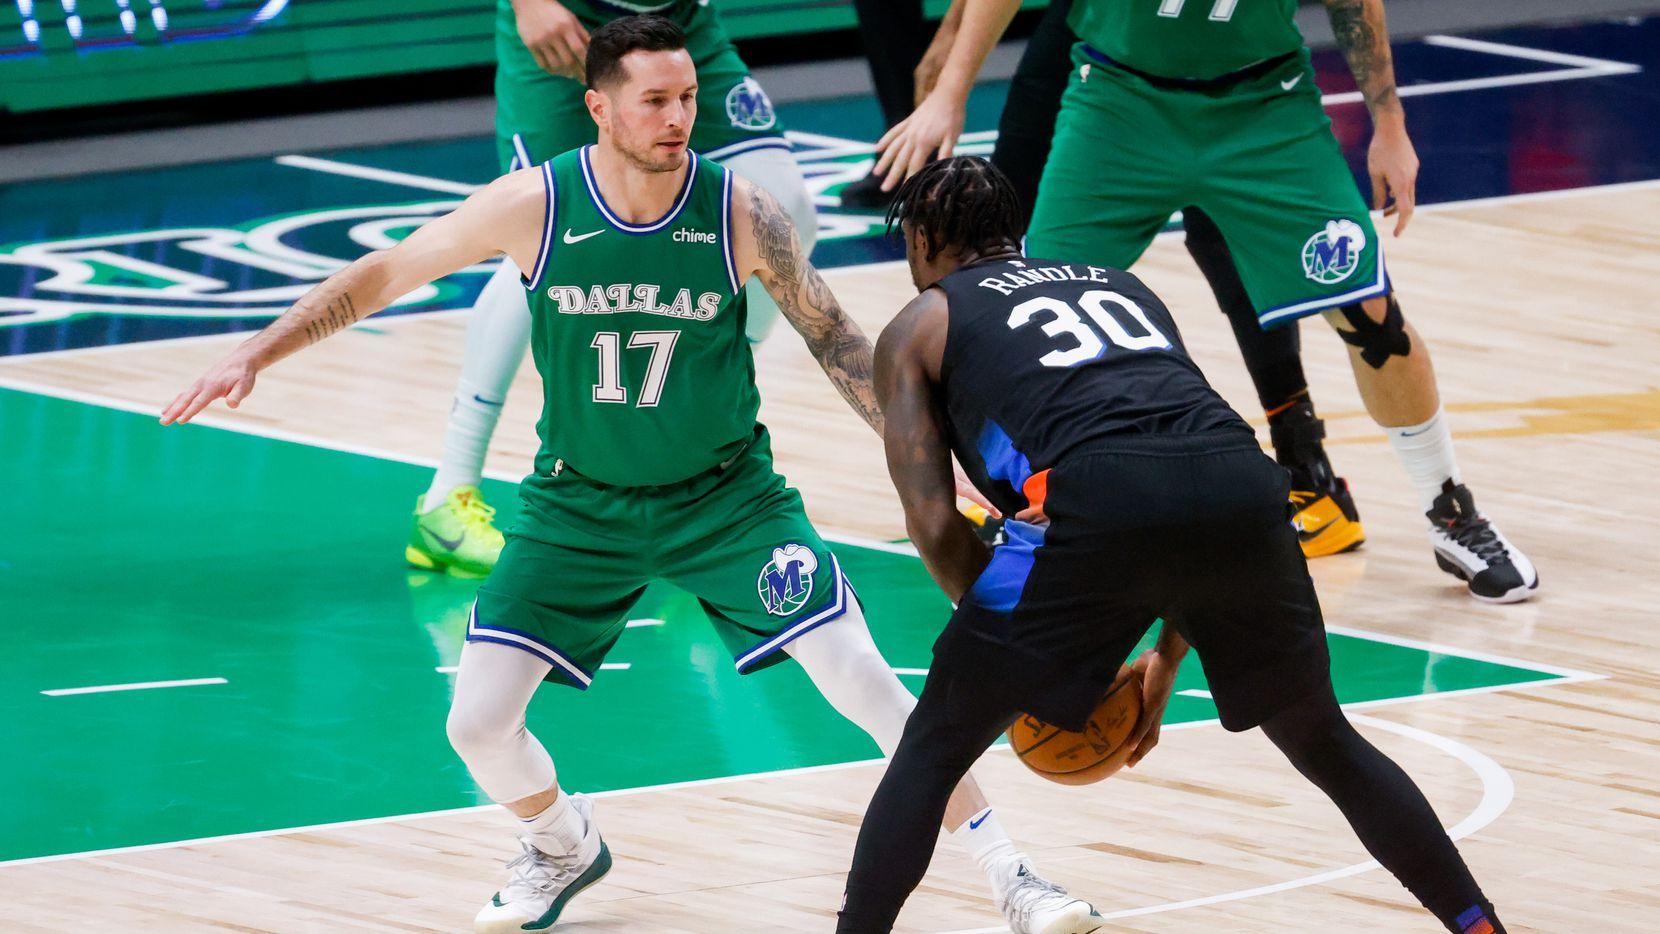 Dallas Mavericks guard JJ Redick (17) blocks New York Knicks forward Julius Randle (30) in the first half at American Airlines Center in Dallas on Friday, April 16, 2021.